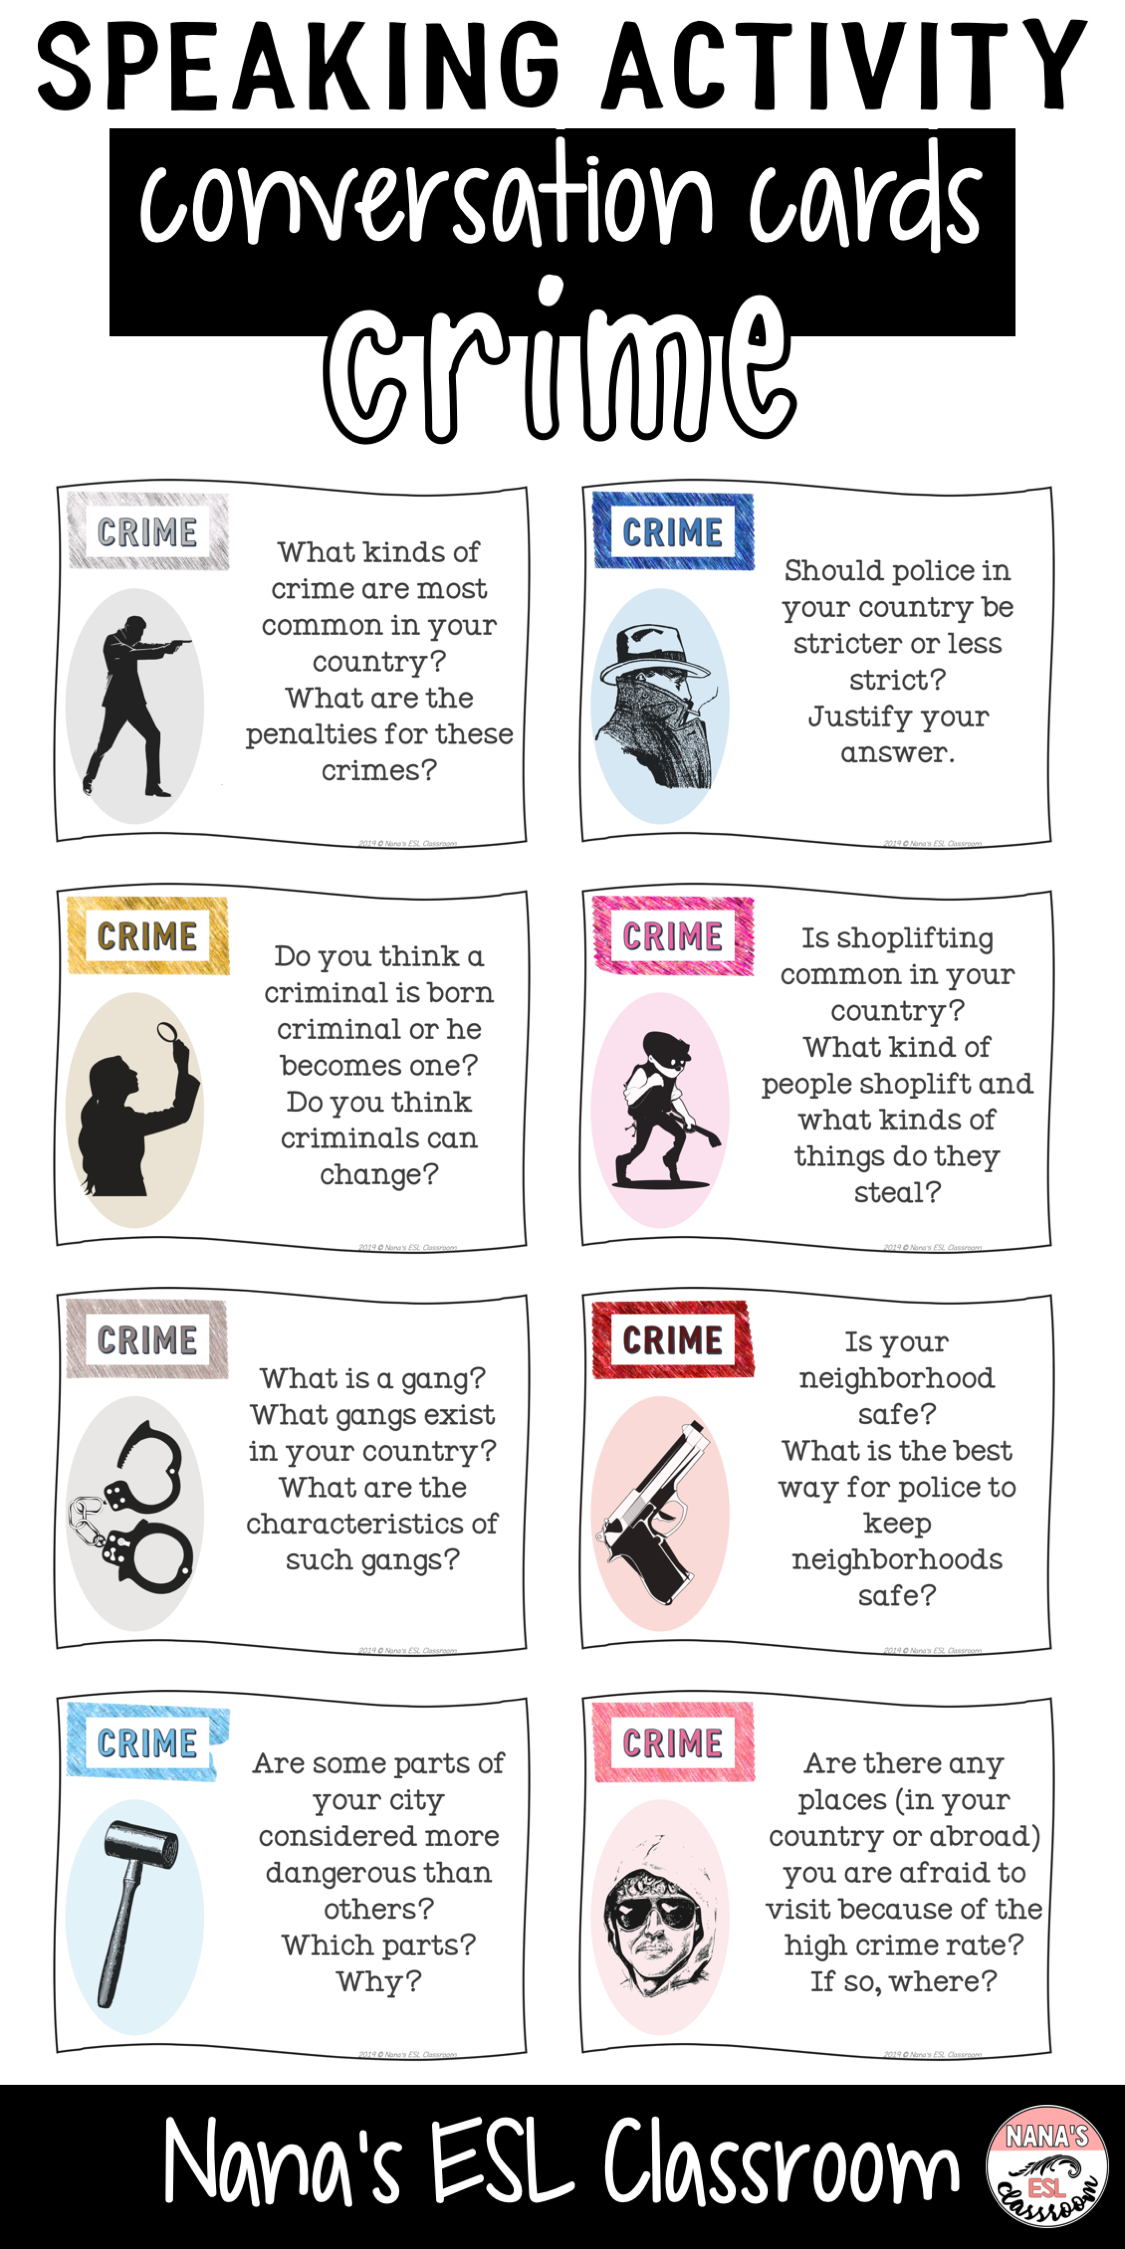 Conversation Starters About Crime